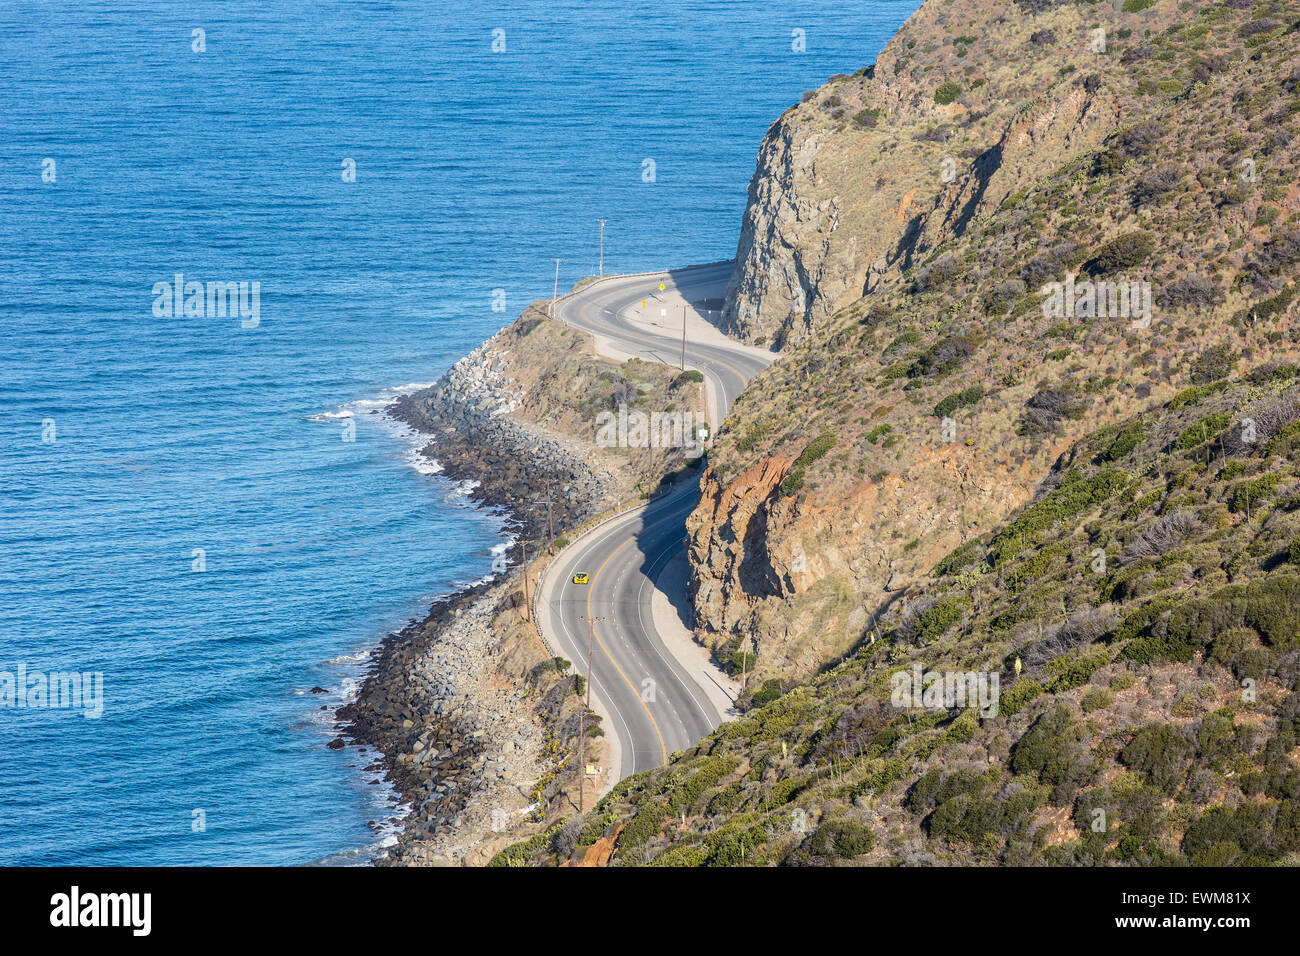 A yellow sports car cruises down Pacific Coast Highway in Malibu, California. Stock Photo